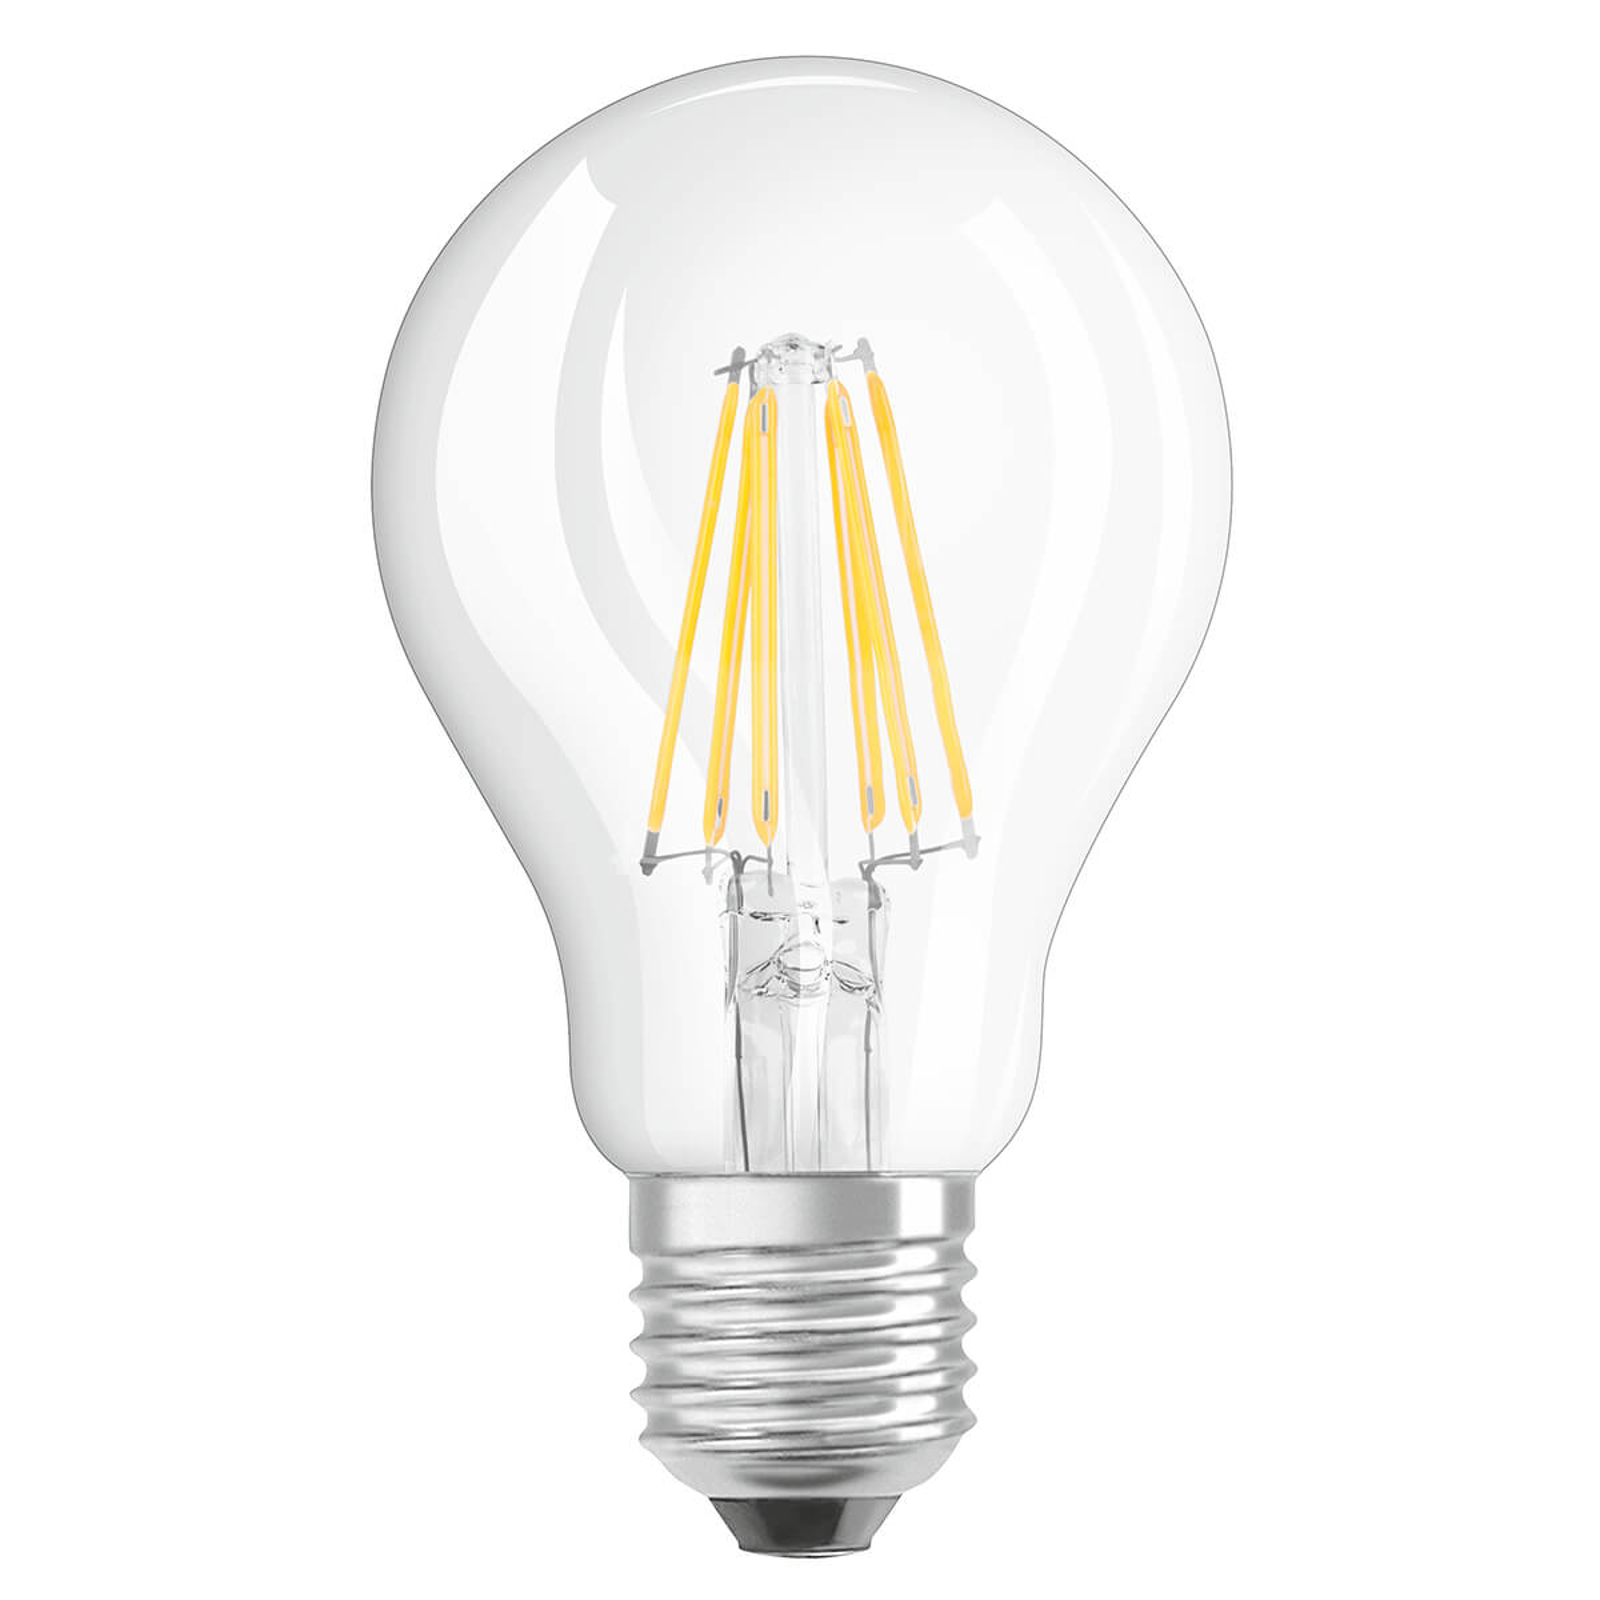 OSRAM-LED-lamppu E27 6,5W perusvalkoinen, 806 lm